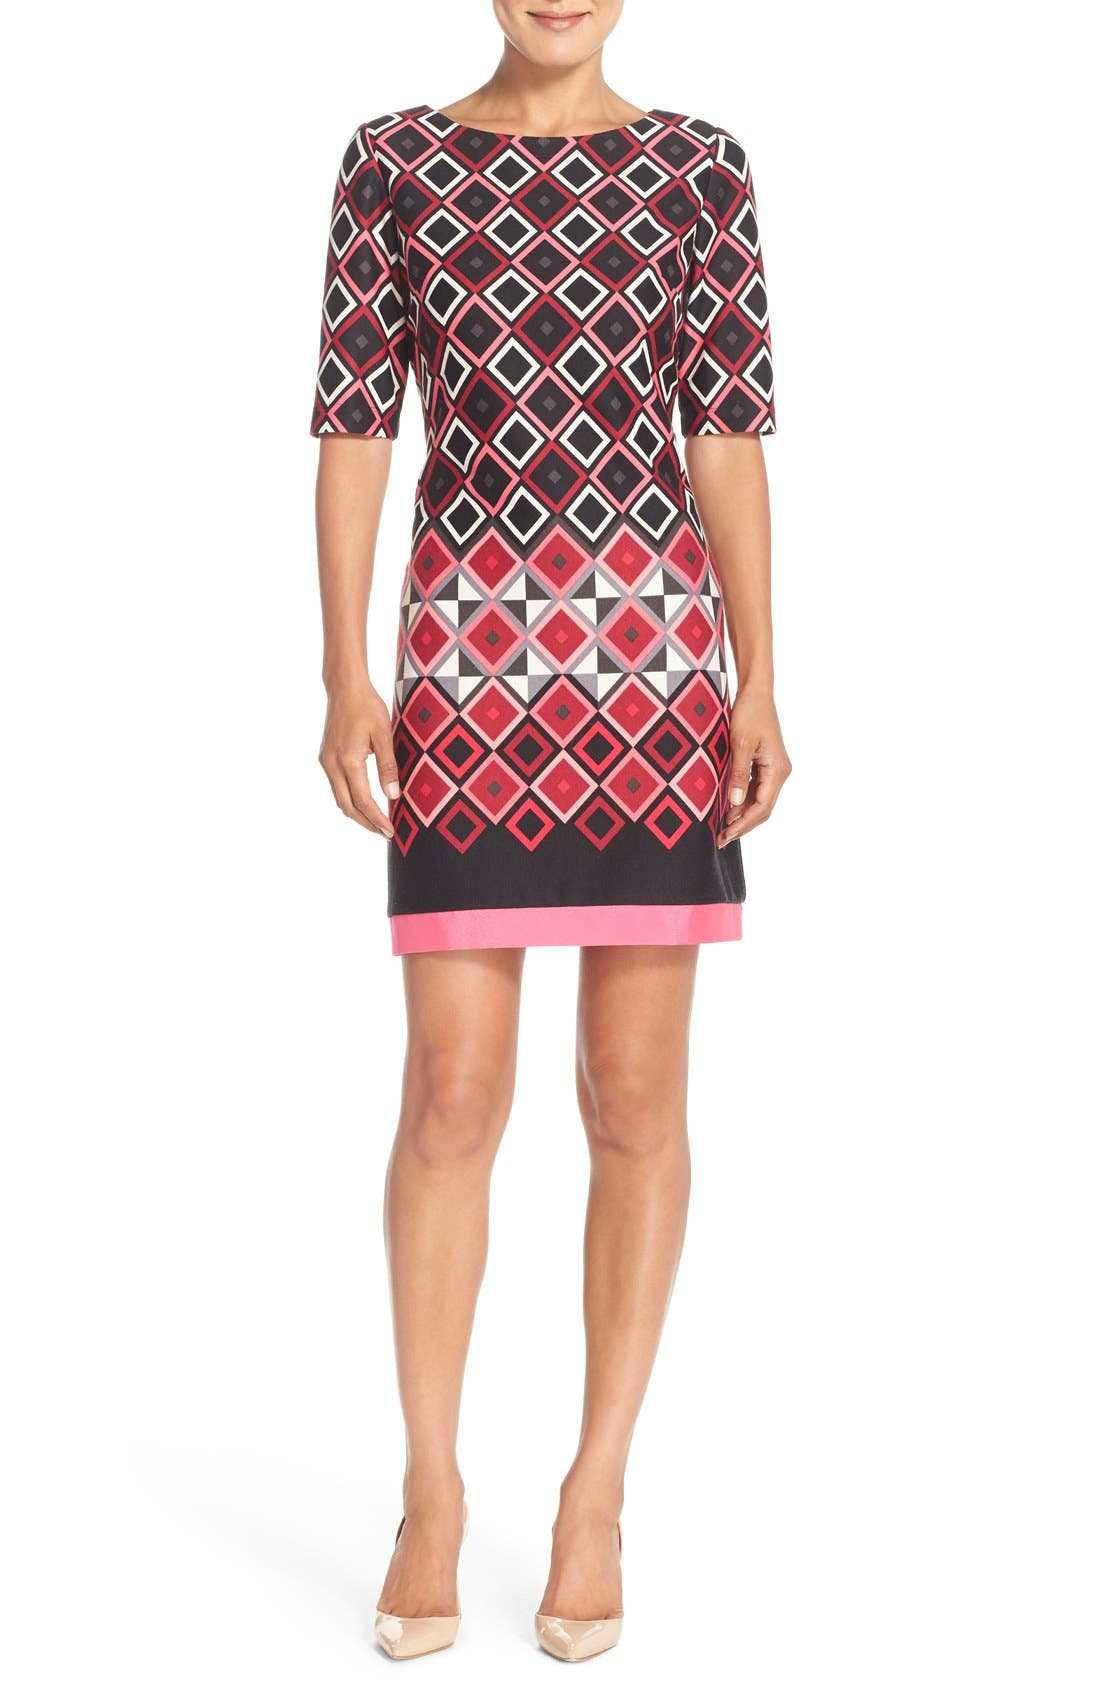 Alternate Image 1 Selected - Eliza J Print Ponte Shift Dress (Regular & Petite)